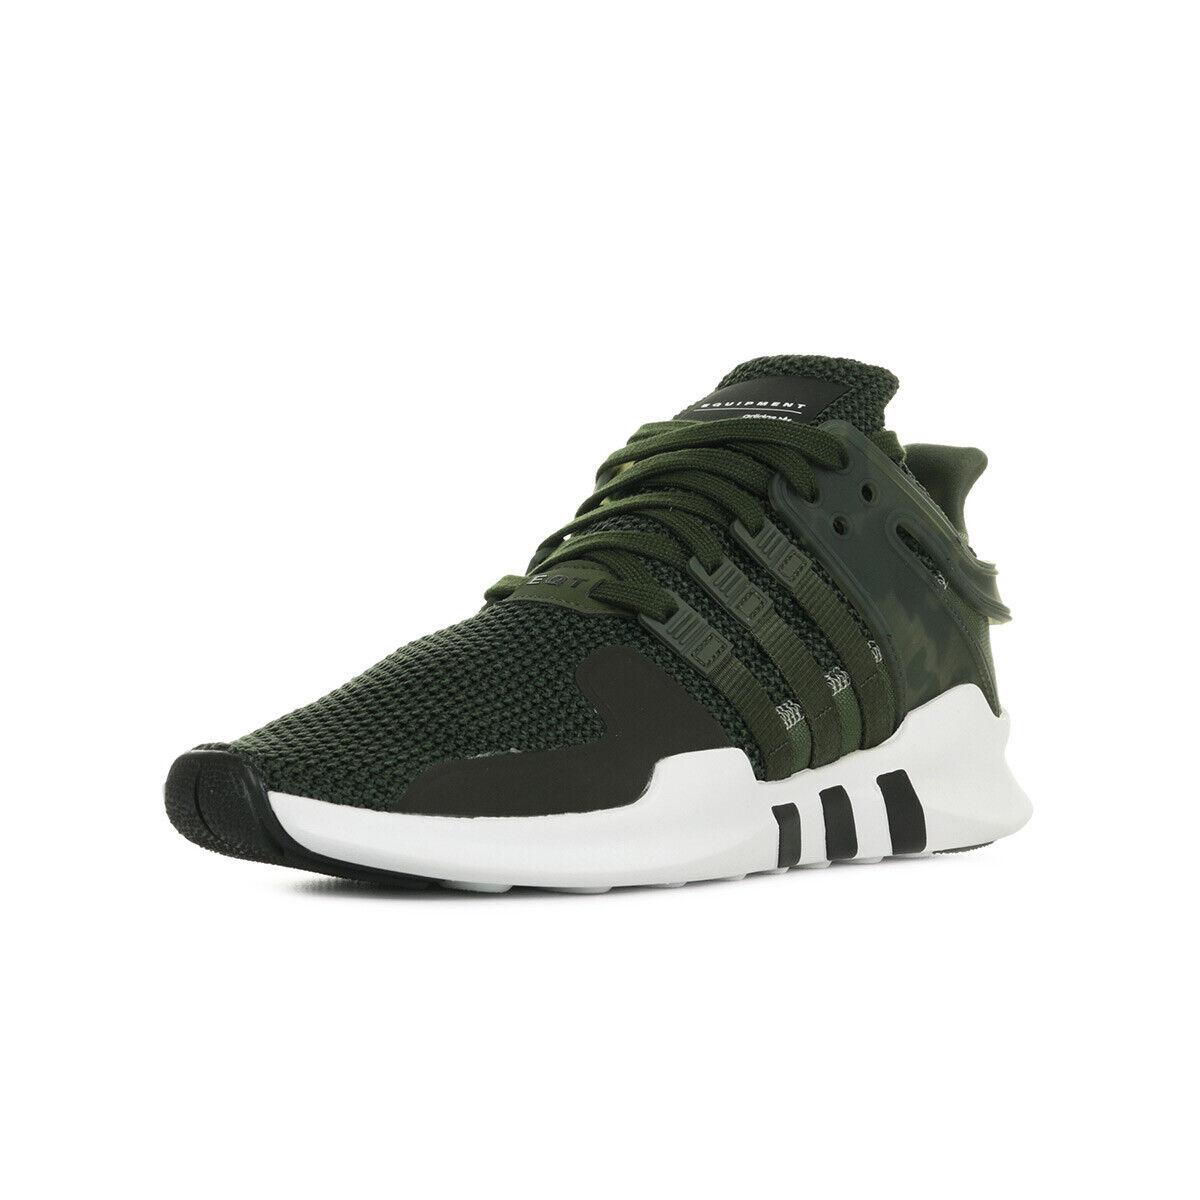 Schuhe adidas Herren EQT Support ADV grün